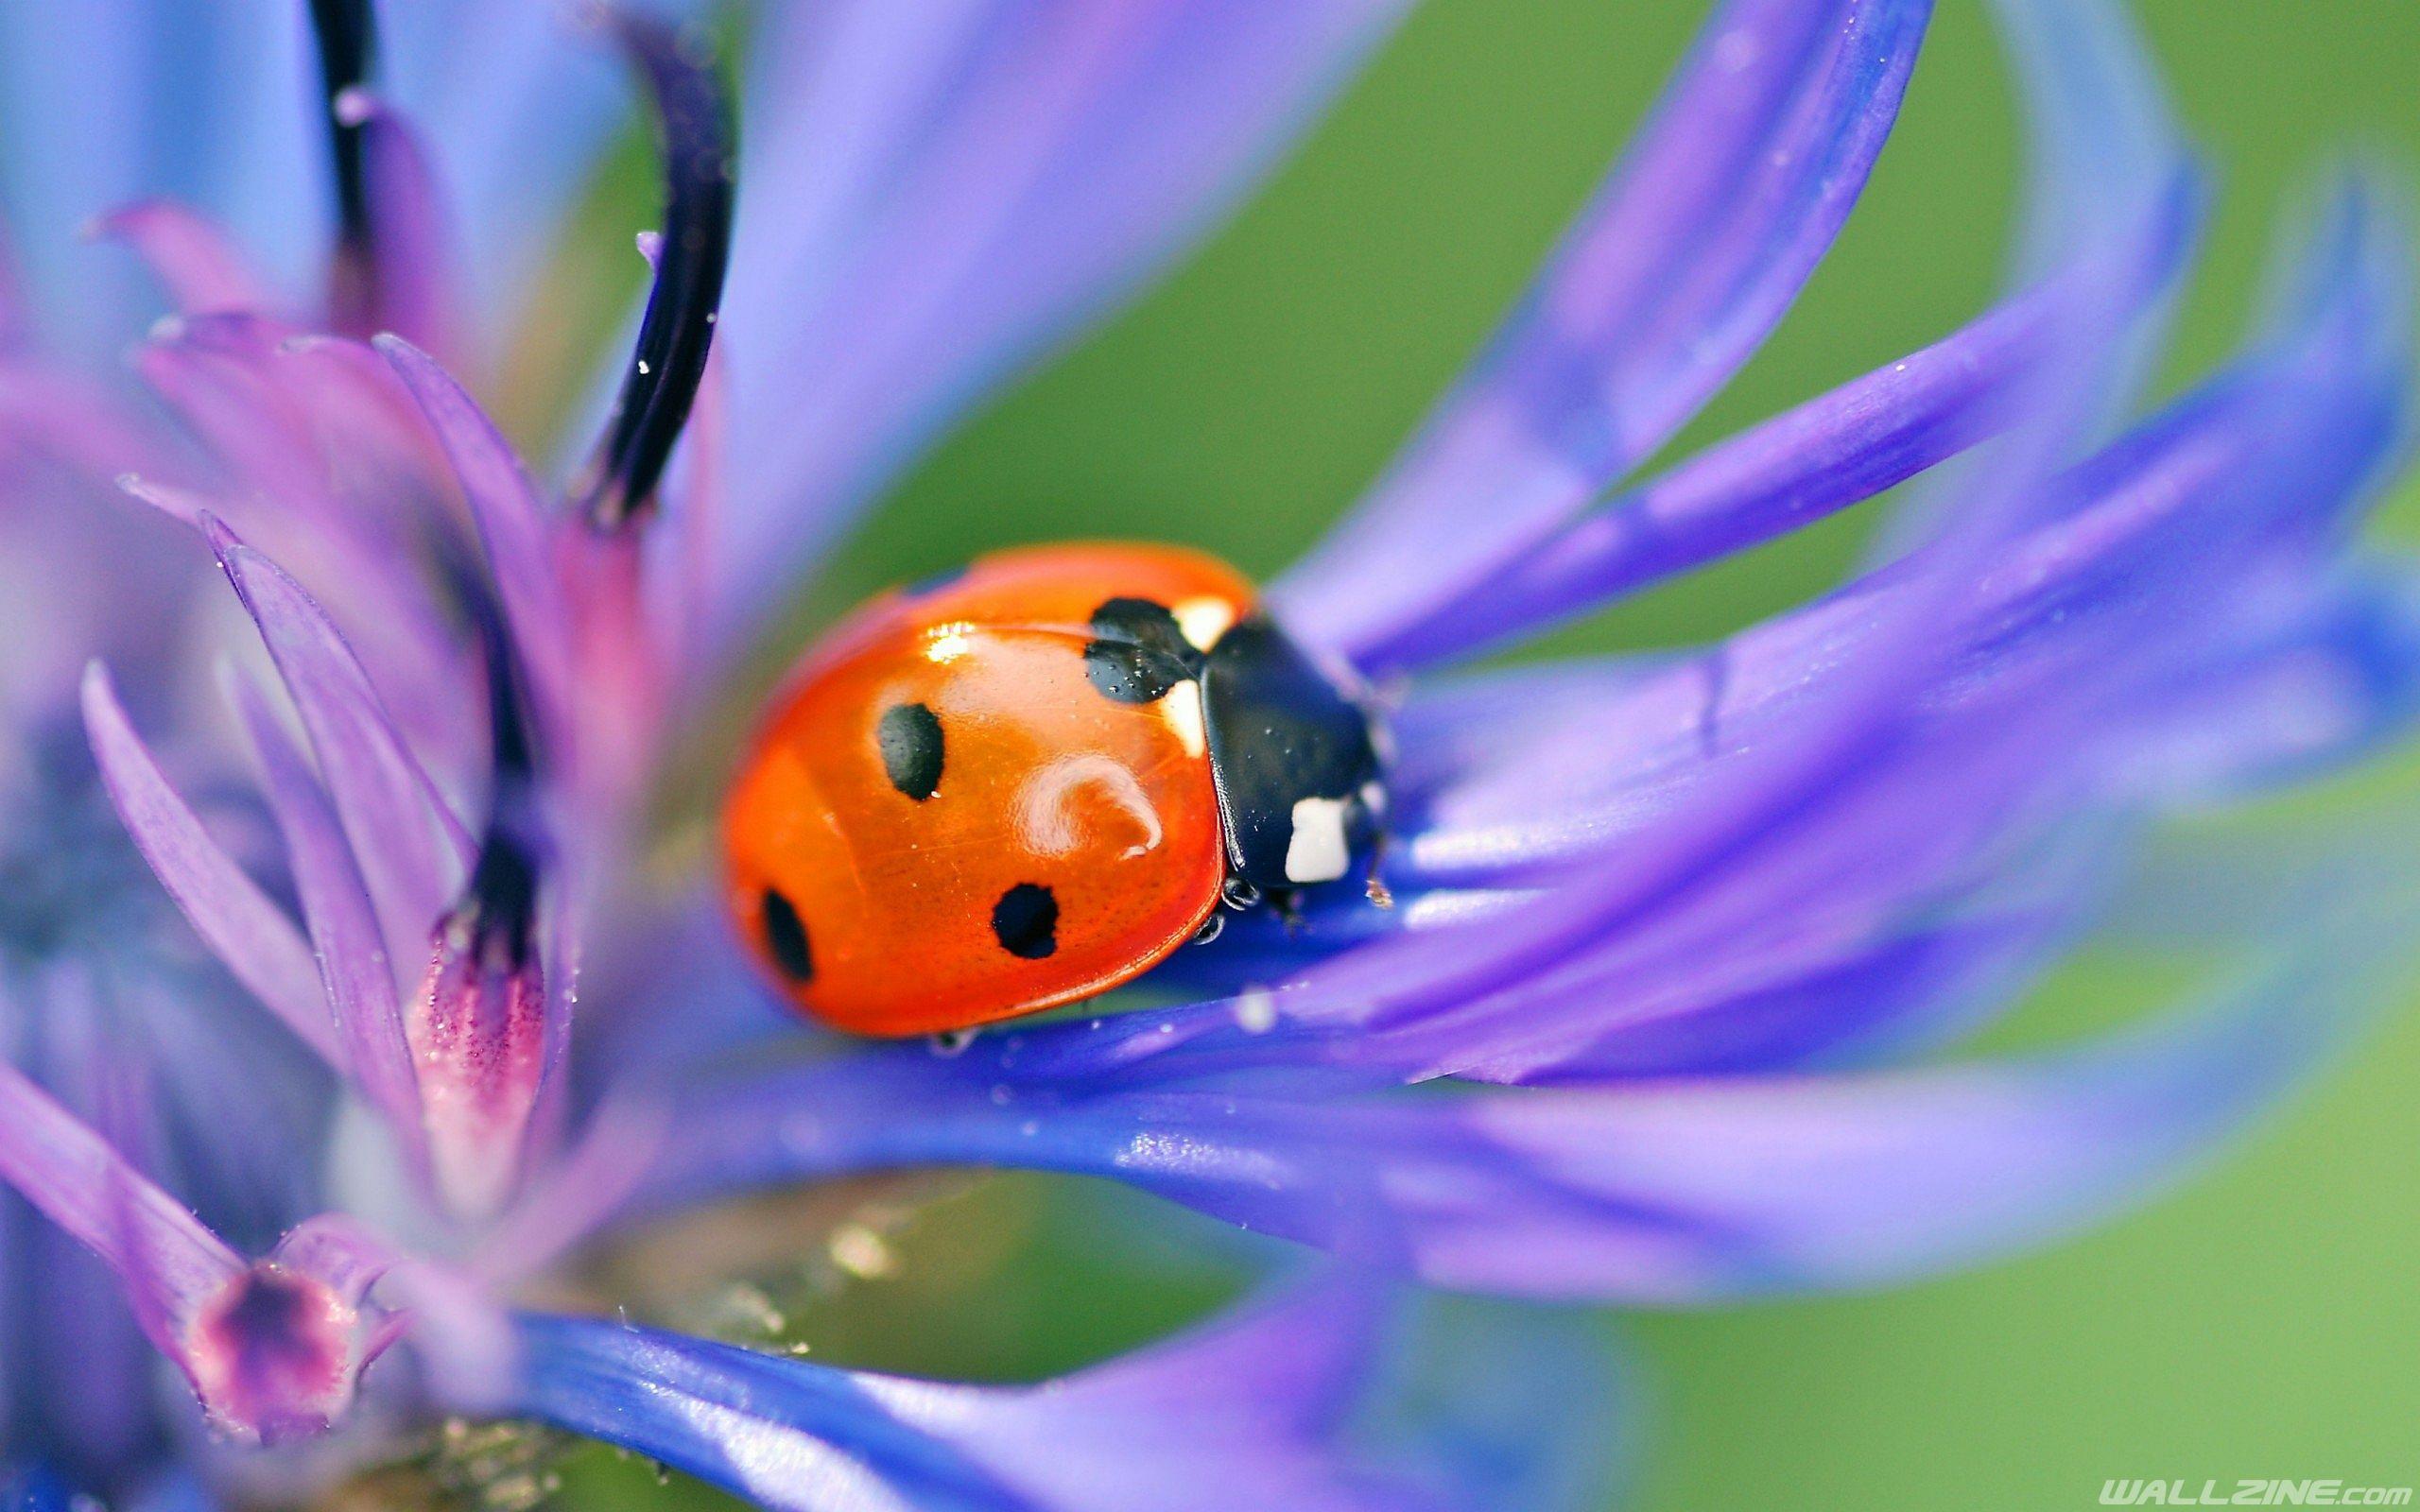 ladybug on a flower wallpaper | hd desktop wallpapers | pinterest